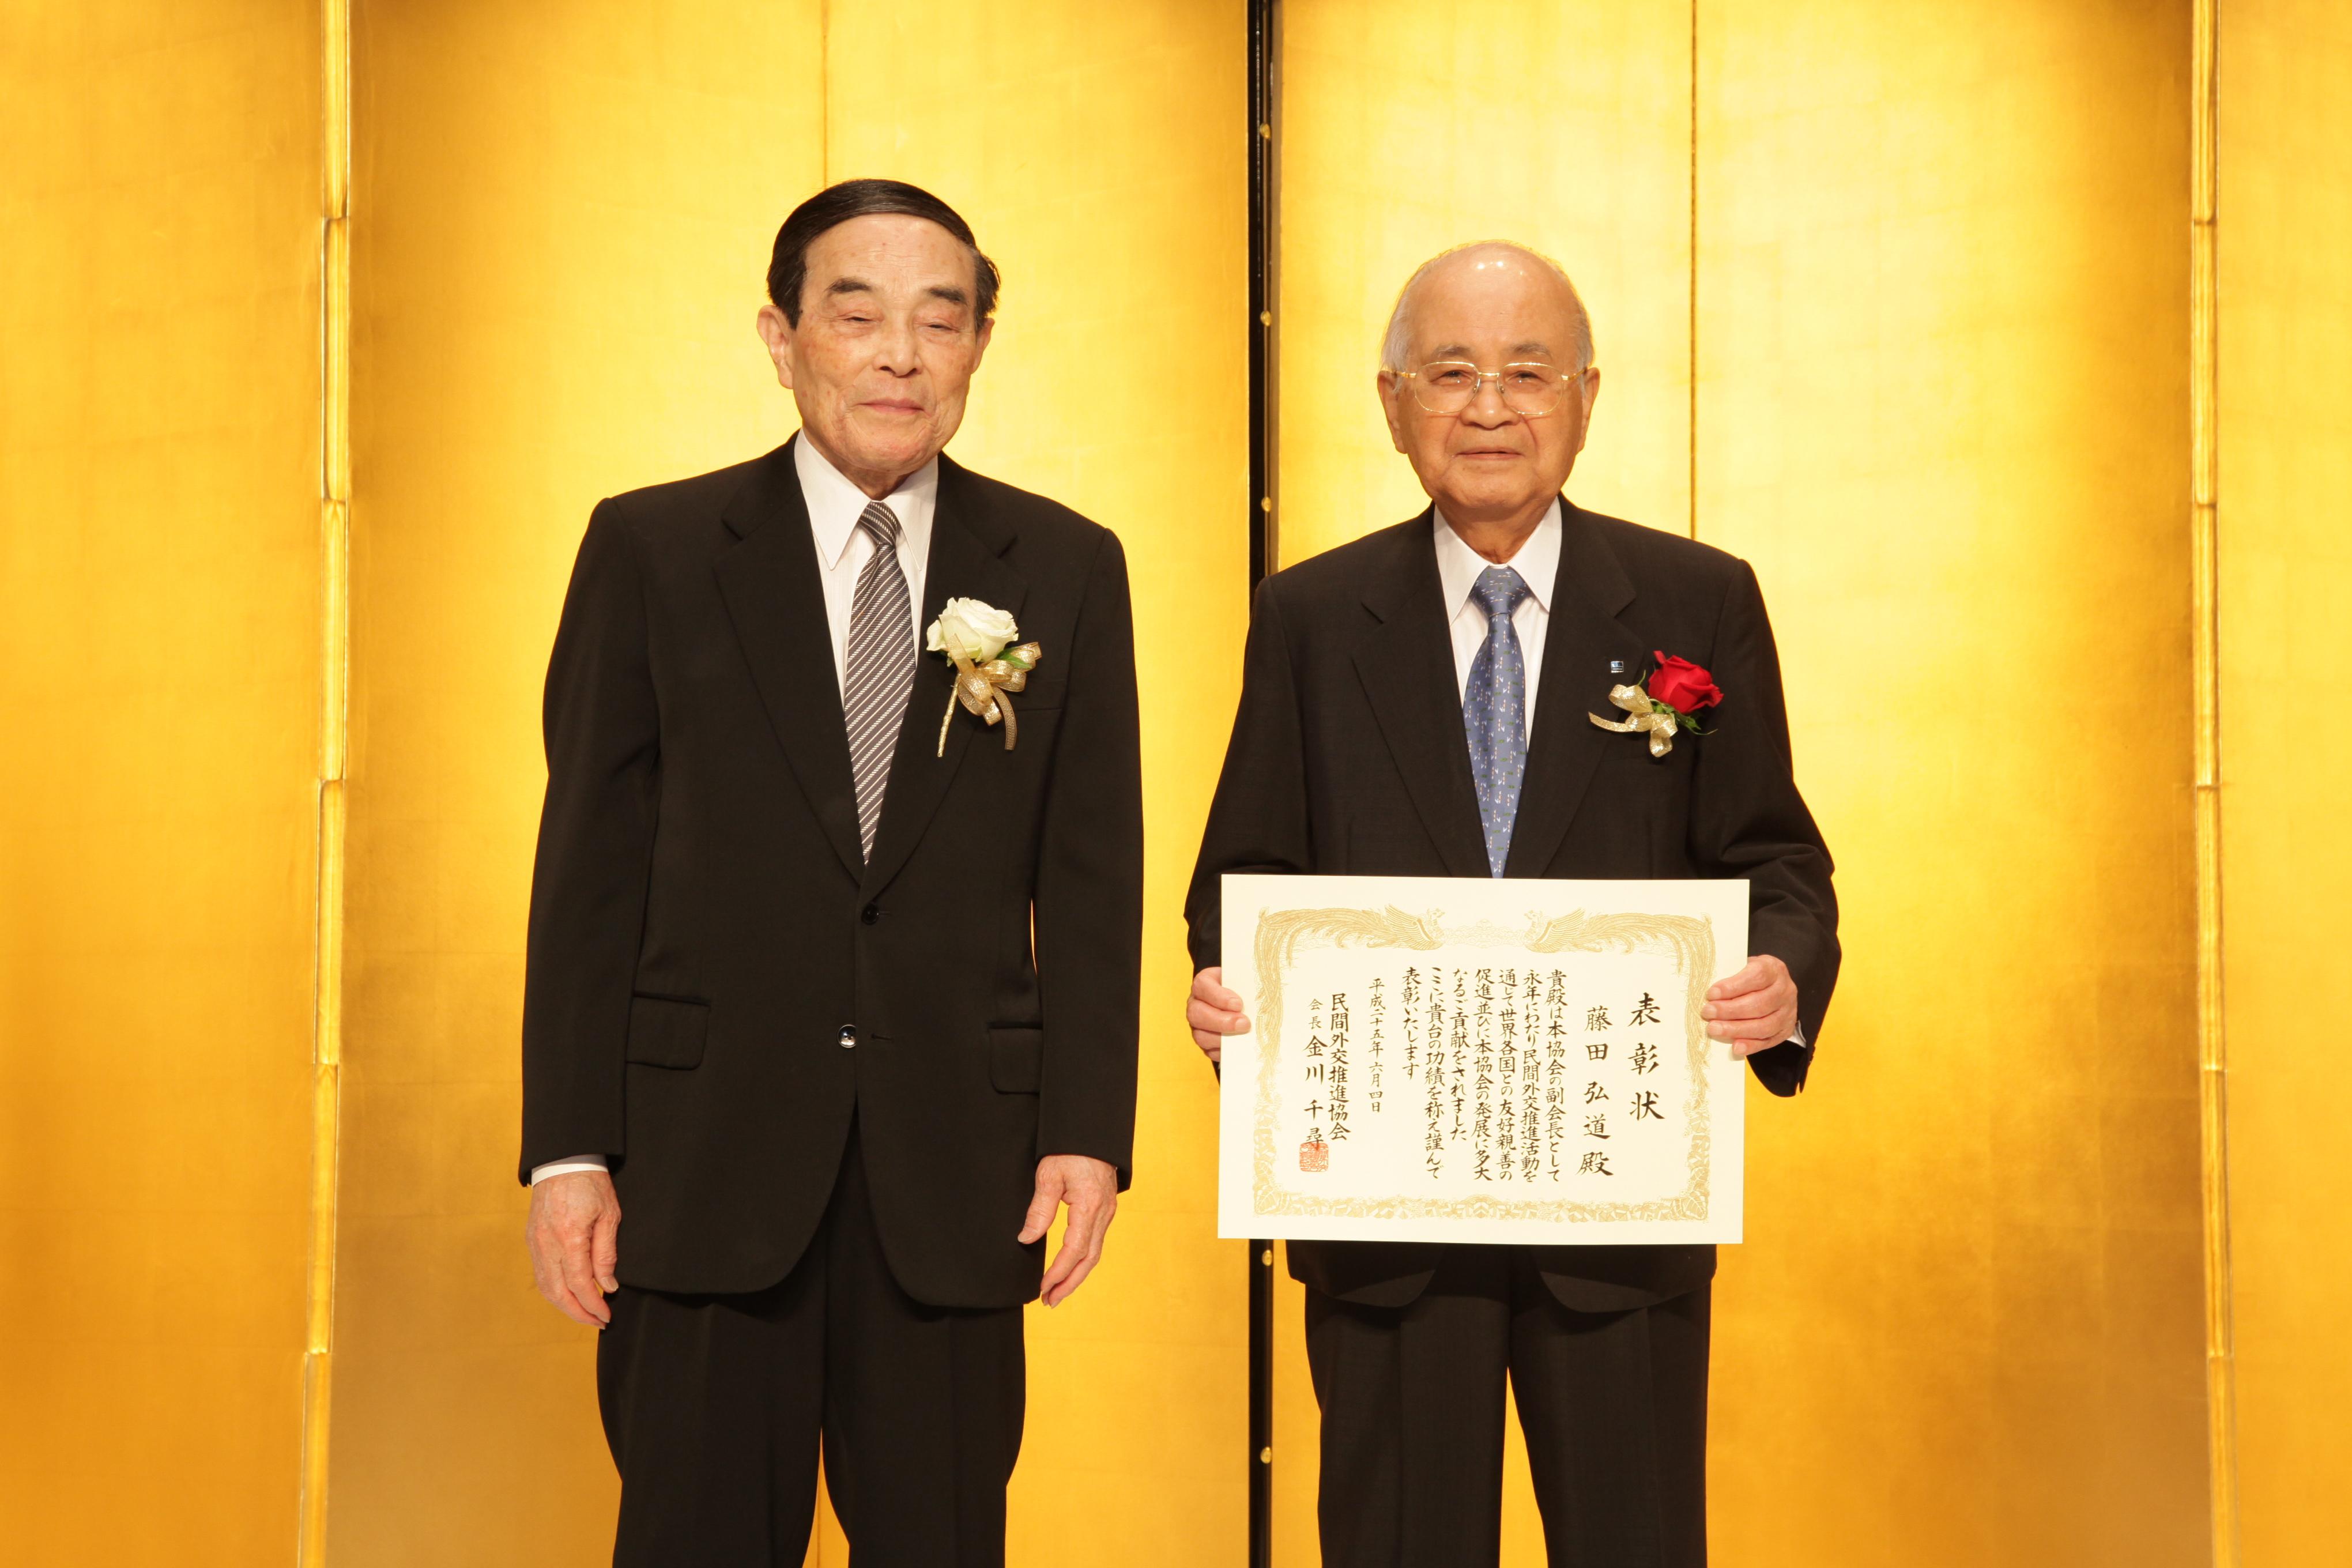 金川FEC会長と永年功労者の藤田弘道FEC副会長